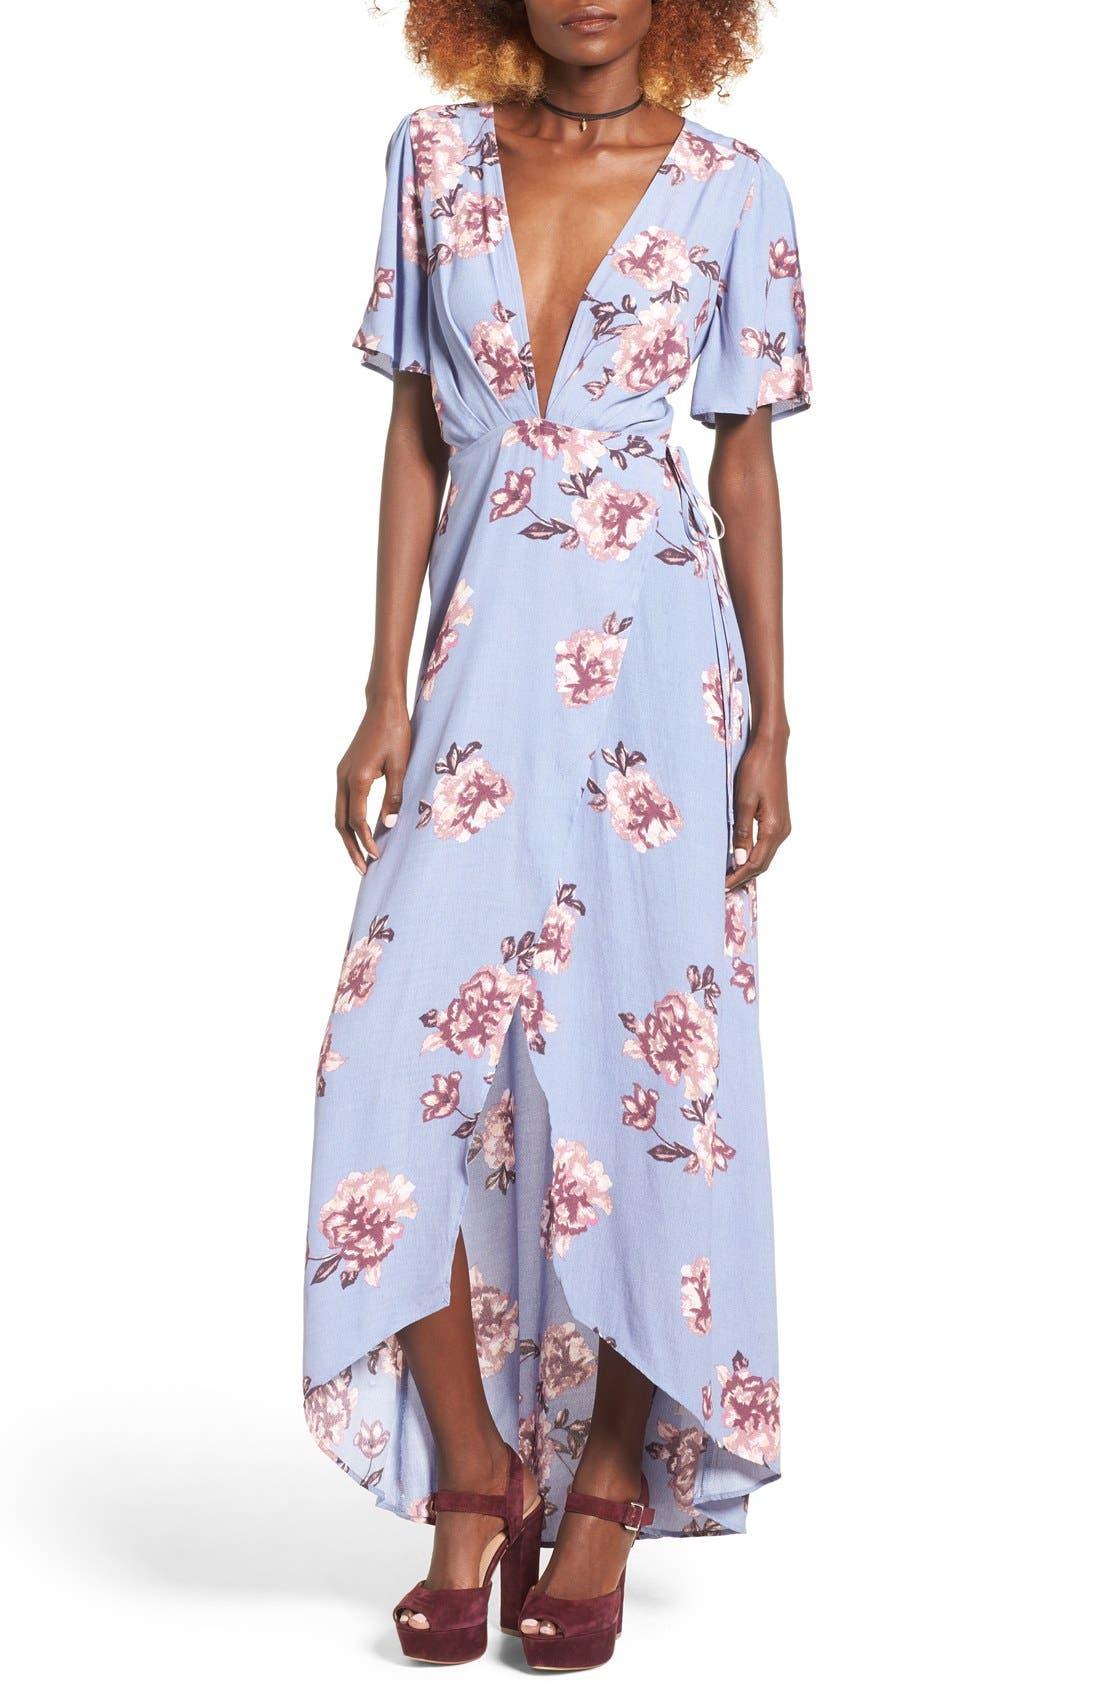 Main Image - ASTR Selma Floral Print Wrap Dress